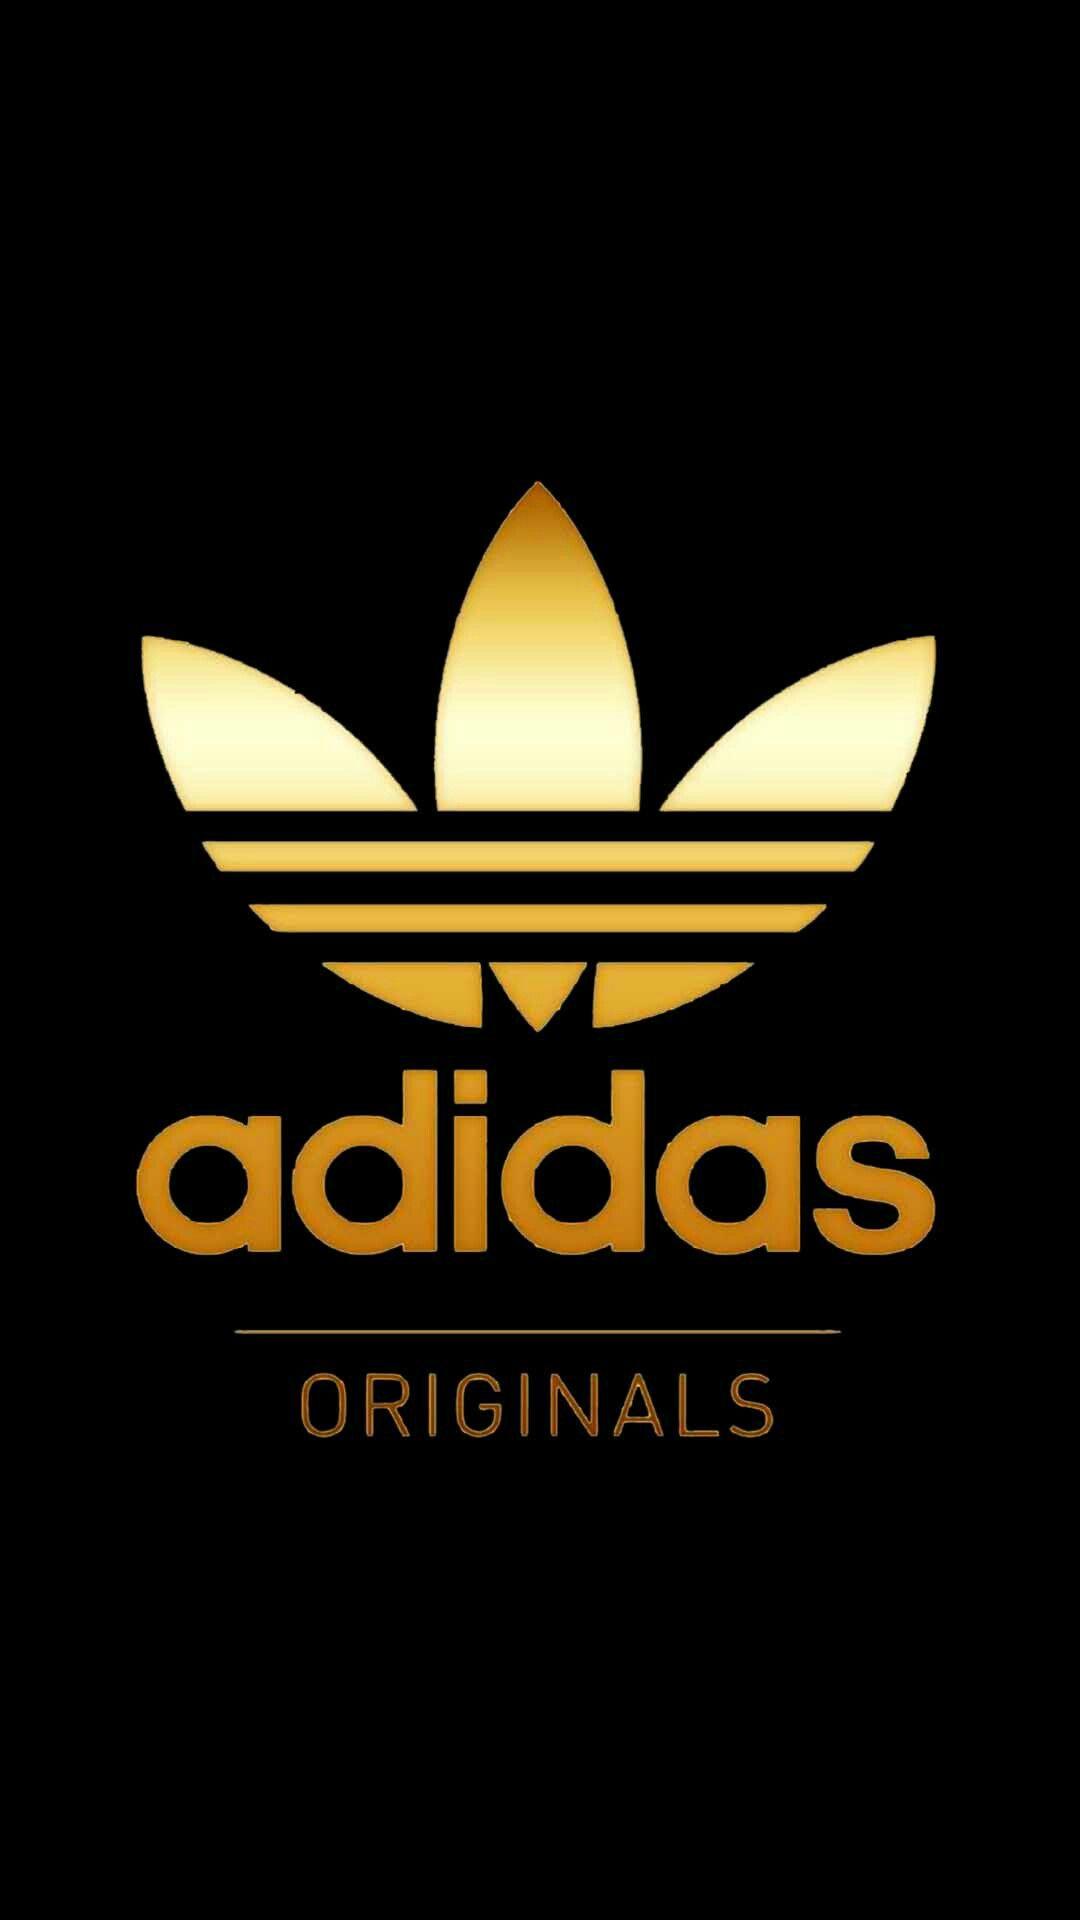 Original Fond écran Adidas Fond écran Samsung Et Fond